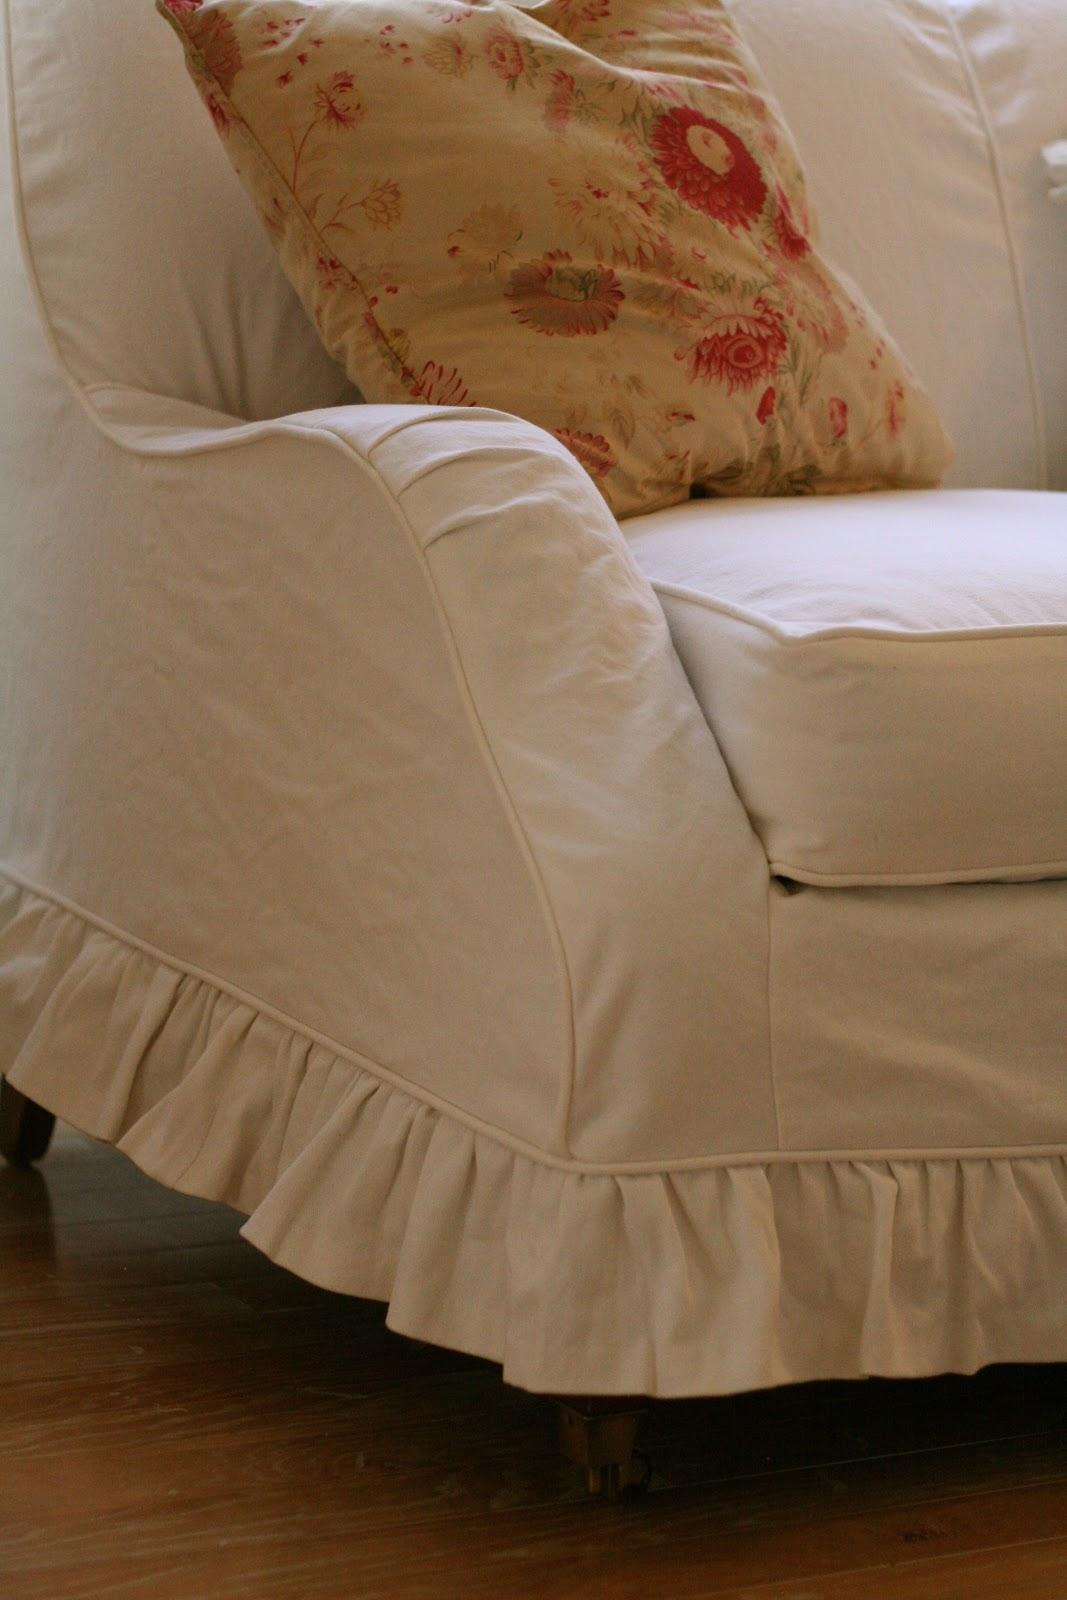 Pleasing White Denim Loveseat With Ruffled Skirt Slipcovers By Shelley Pdpeps Interior Chair Design Pdpepsorg